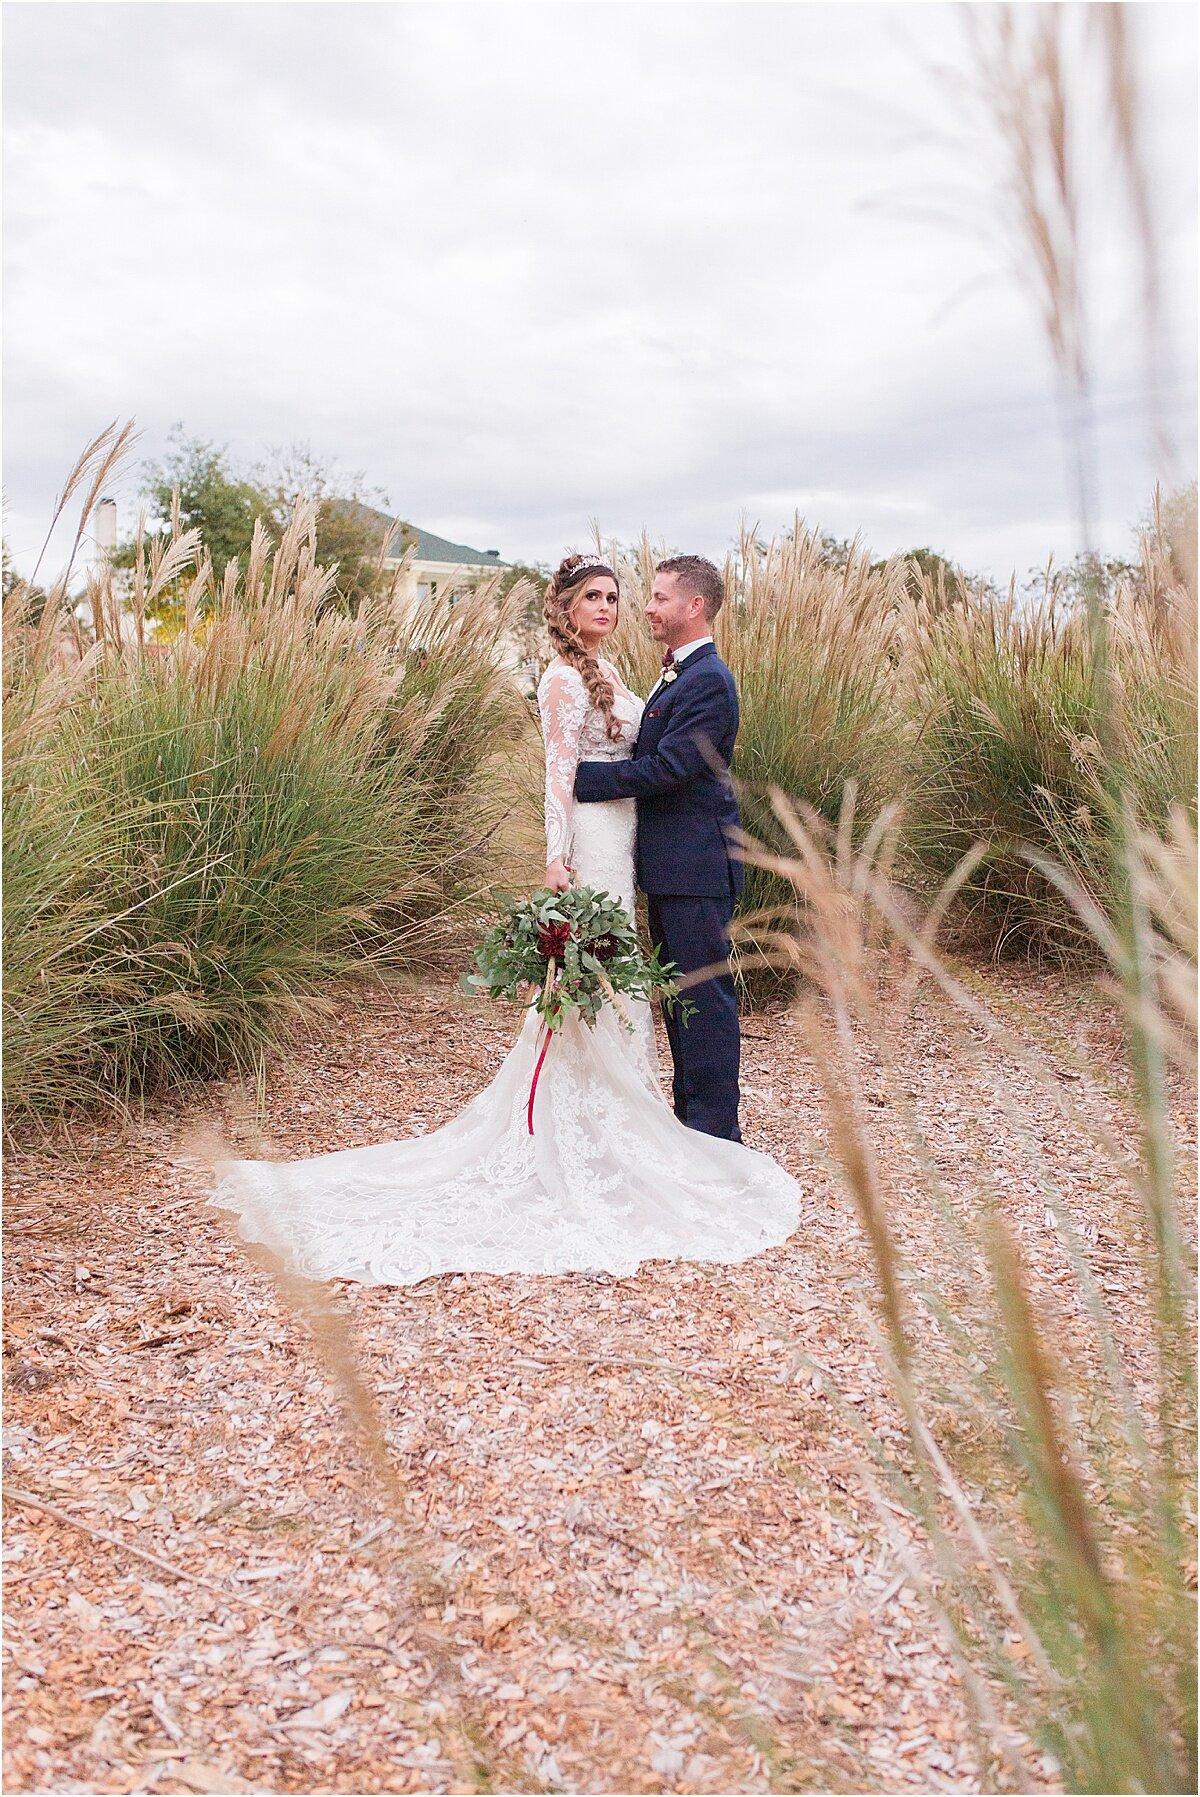 Jersey_Ga_Wedding_Venues_Holly_L_Robbins_Photography_0100.jpg